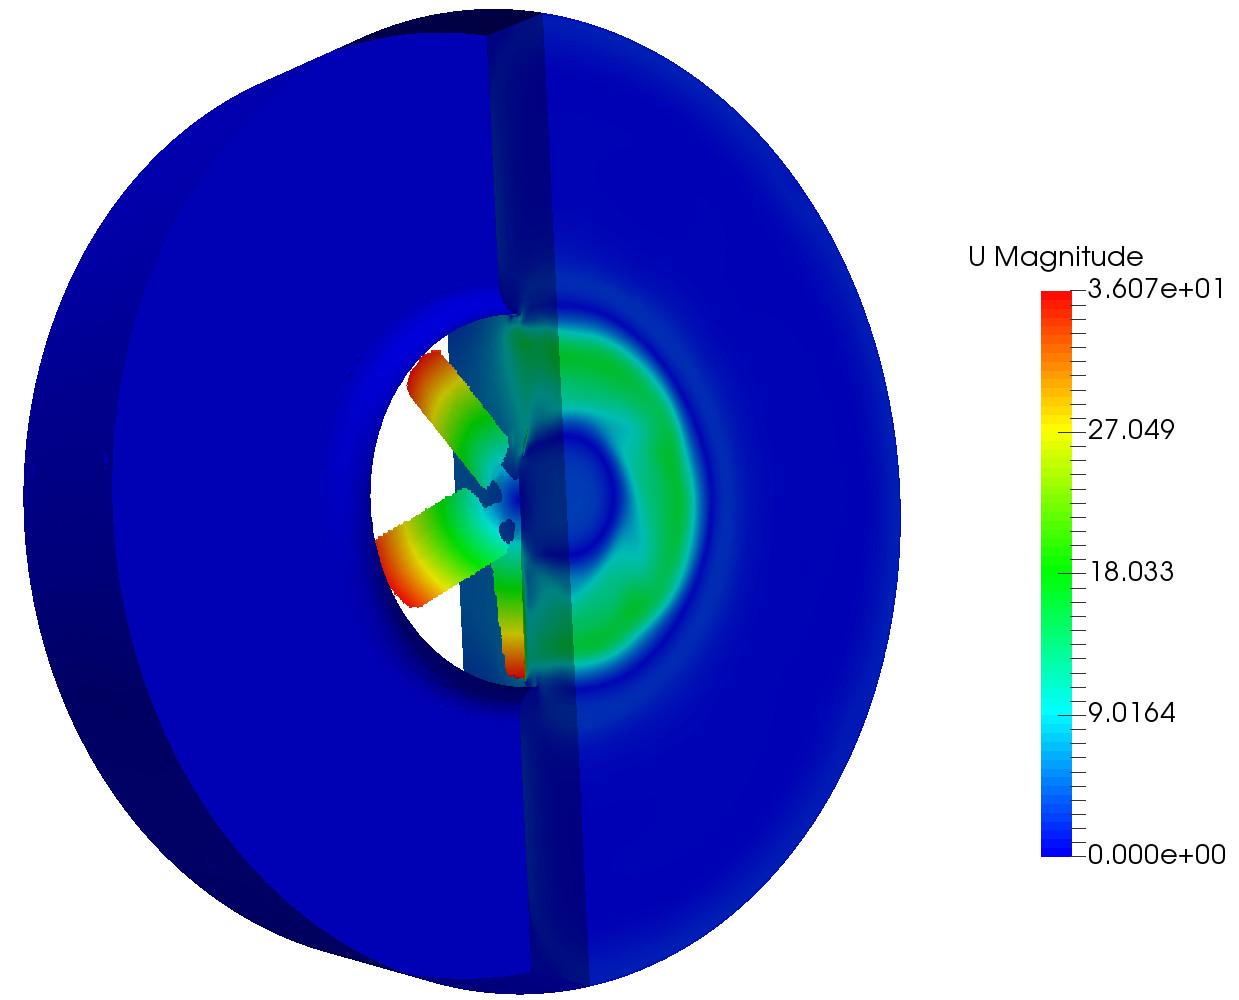 CFD analysis of fan, CFD analysis of Turbomachinery